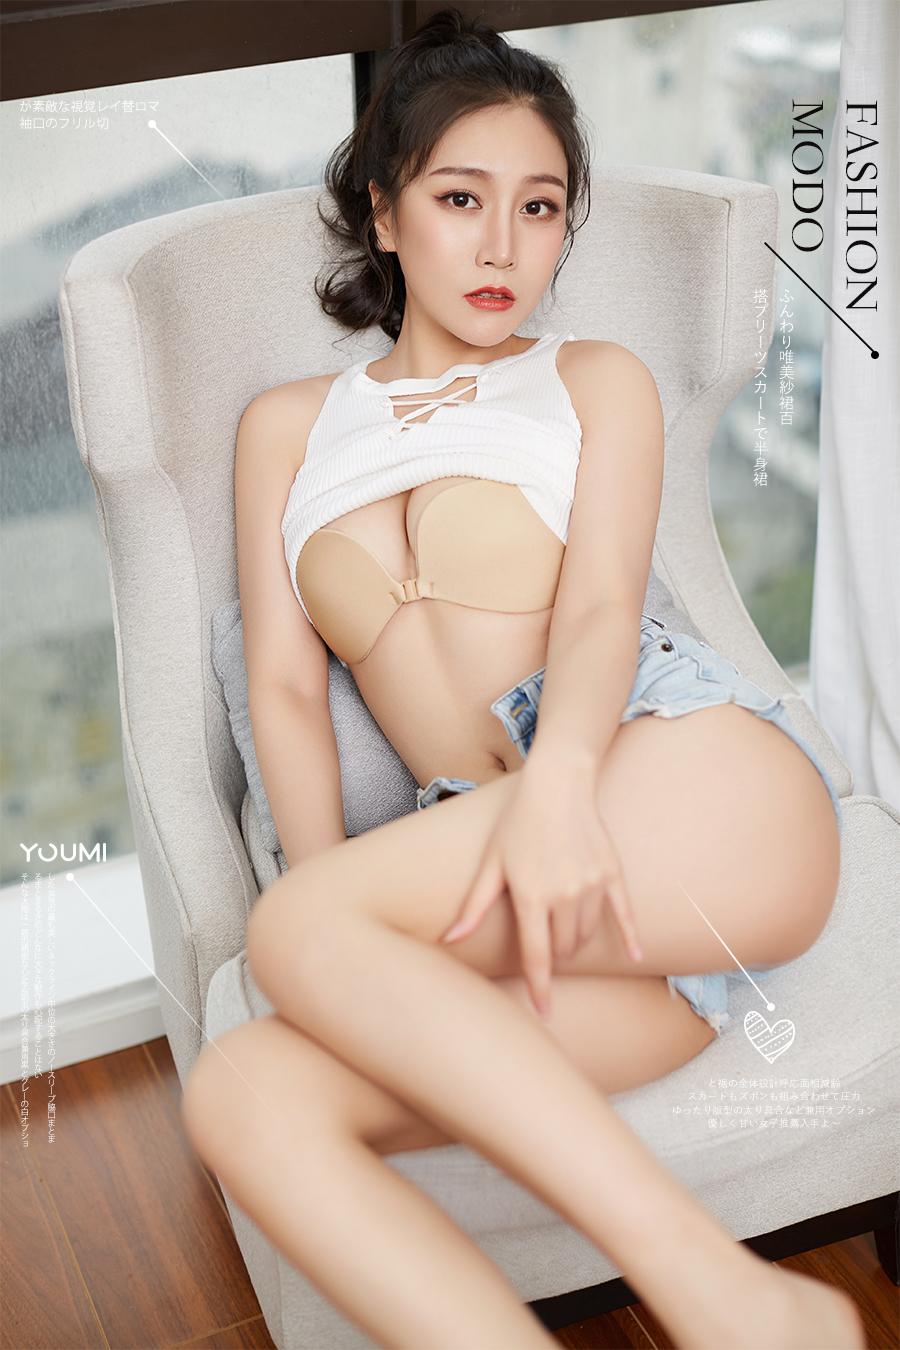 [YouMi尤蜜]2019.08.06 情人梦 张茜茹[/33MB]